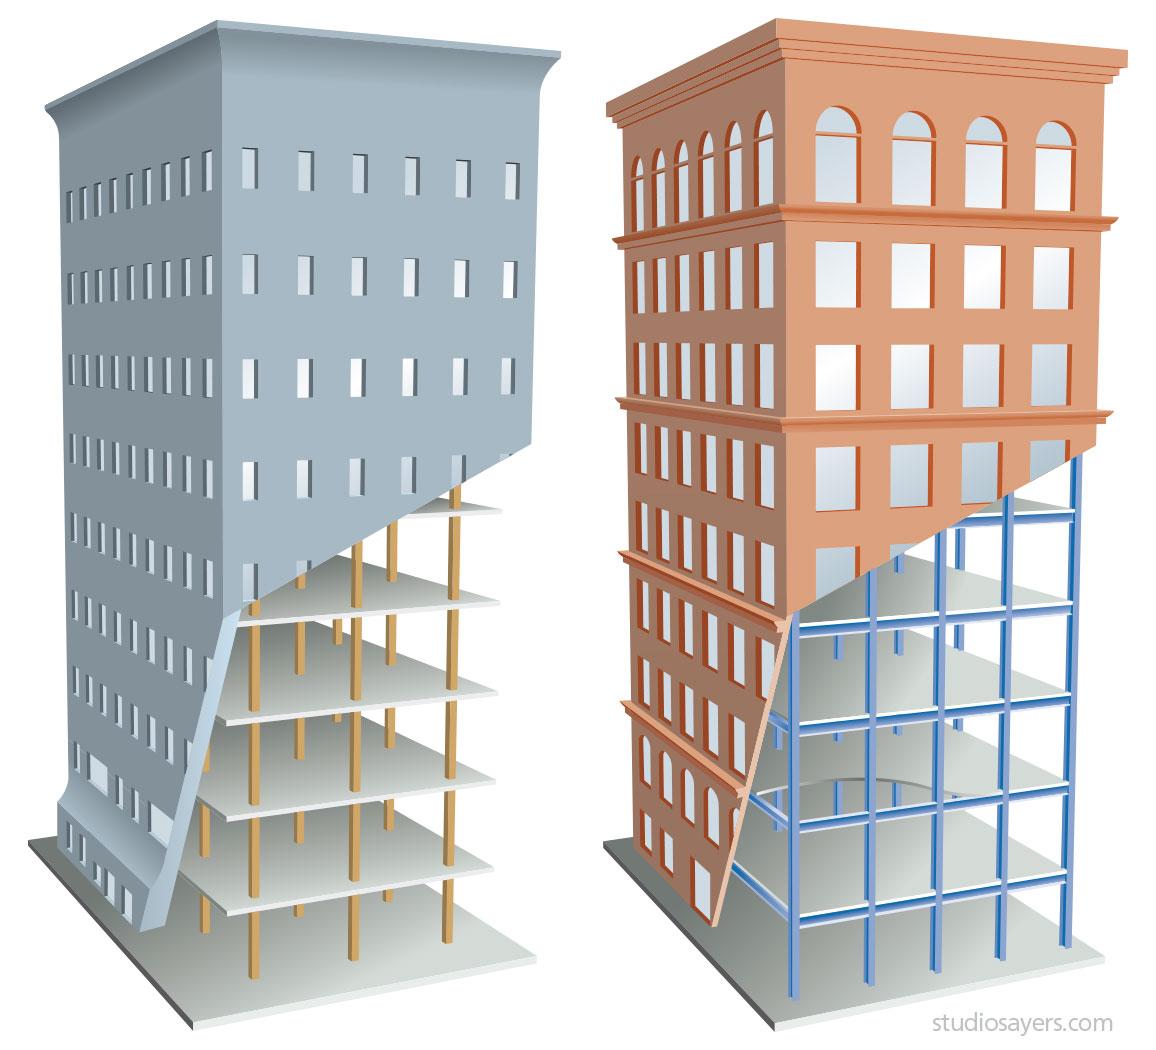 masonry vs. steel skyscraper construction